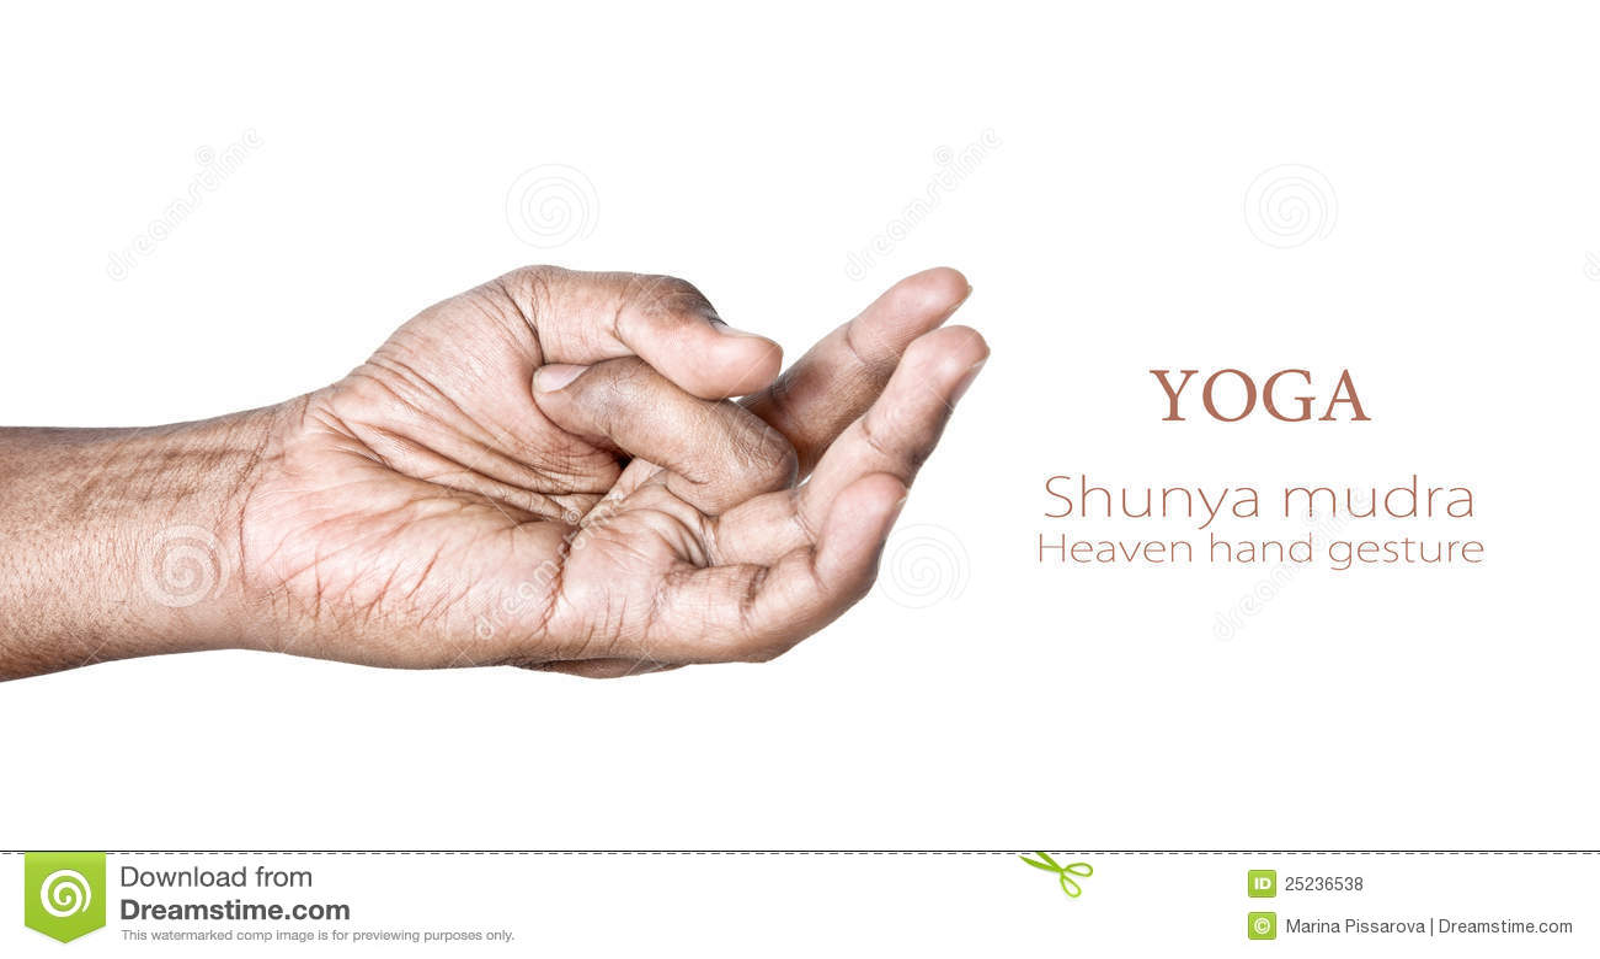 Mudra shunya joga